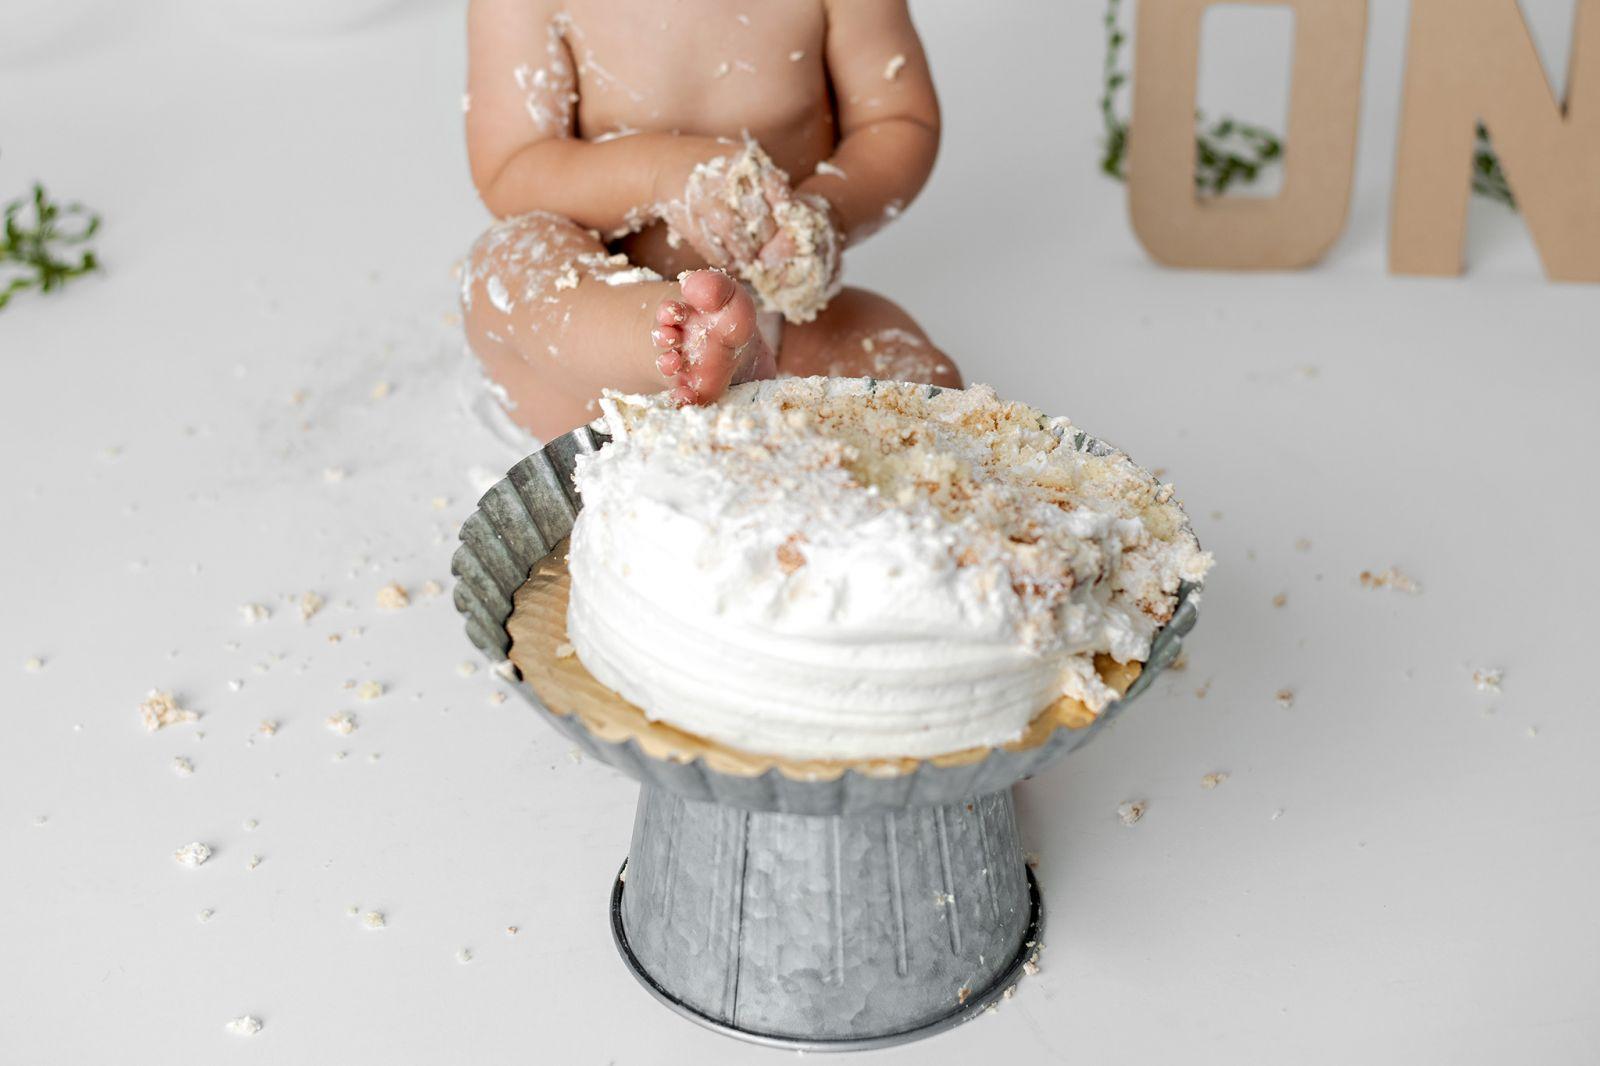 simple-and-white-studio-cake-smash-goose-creek-sc-03